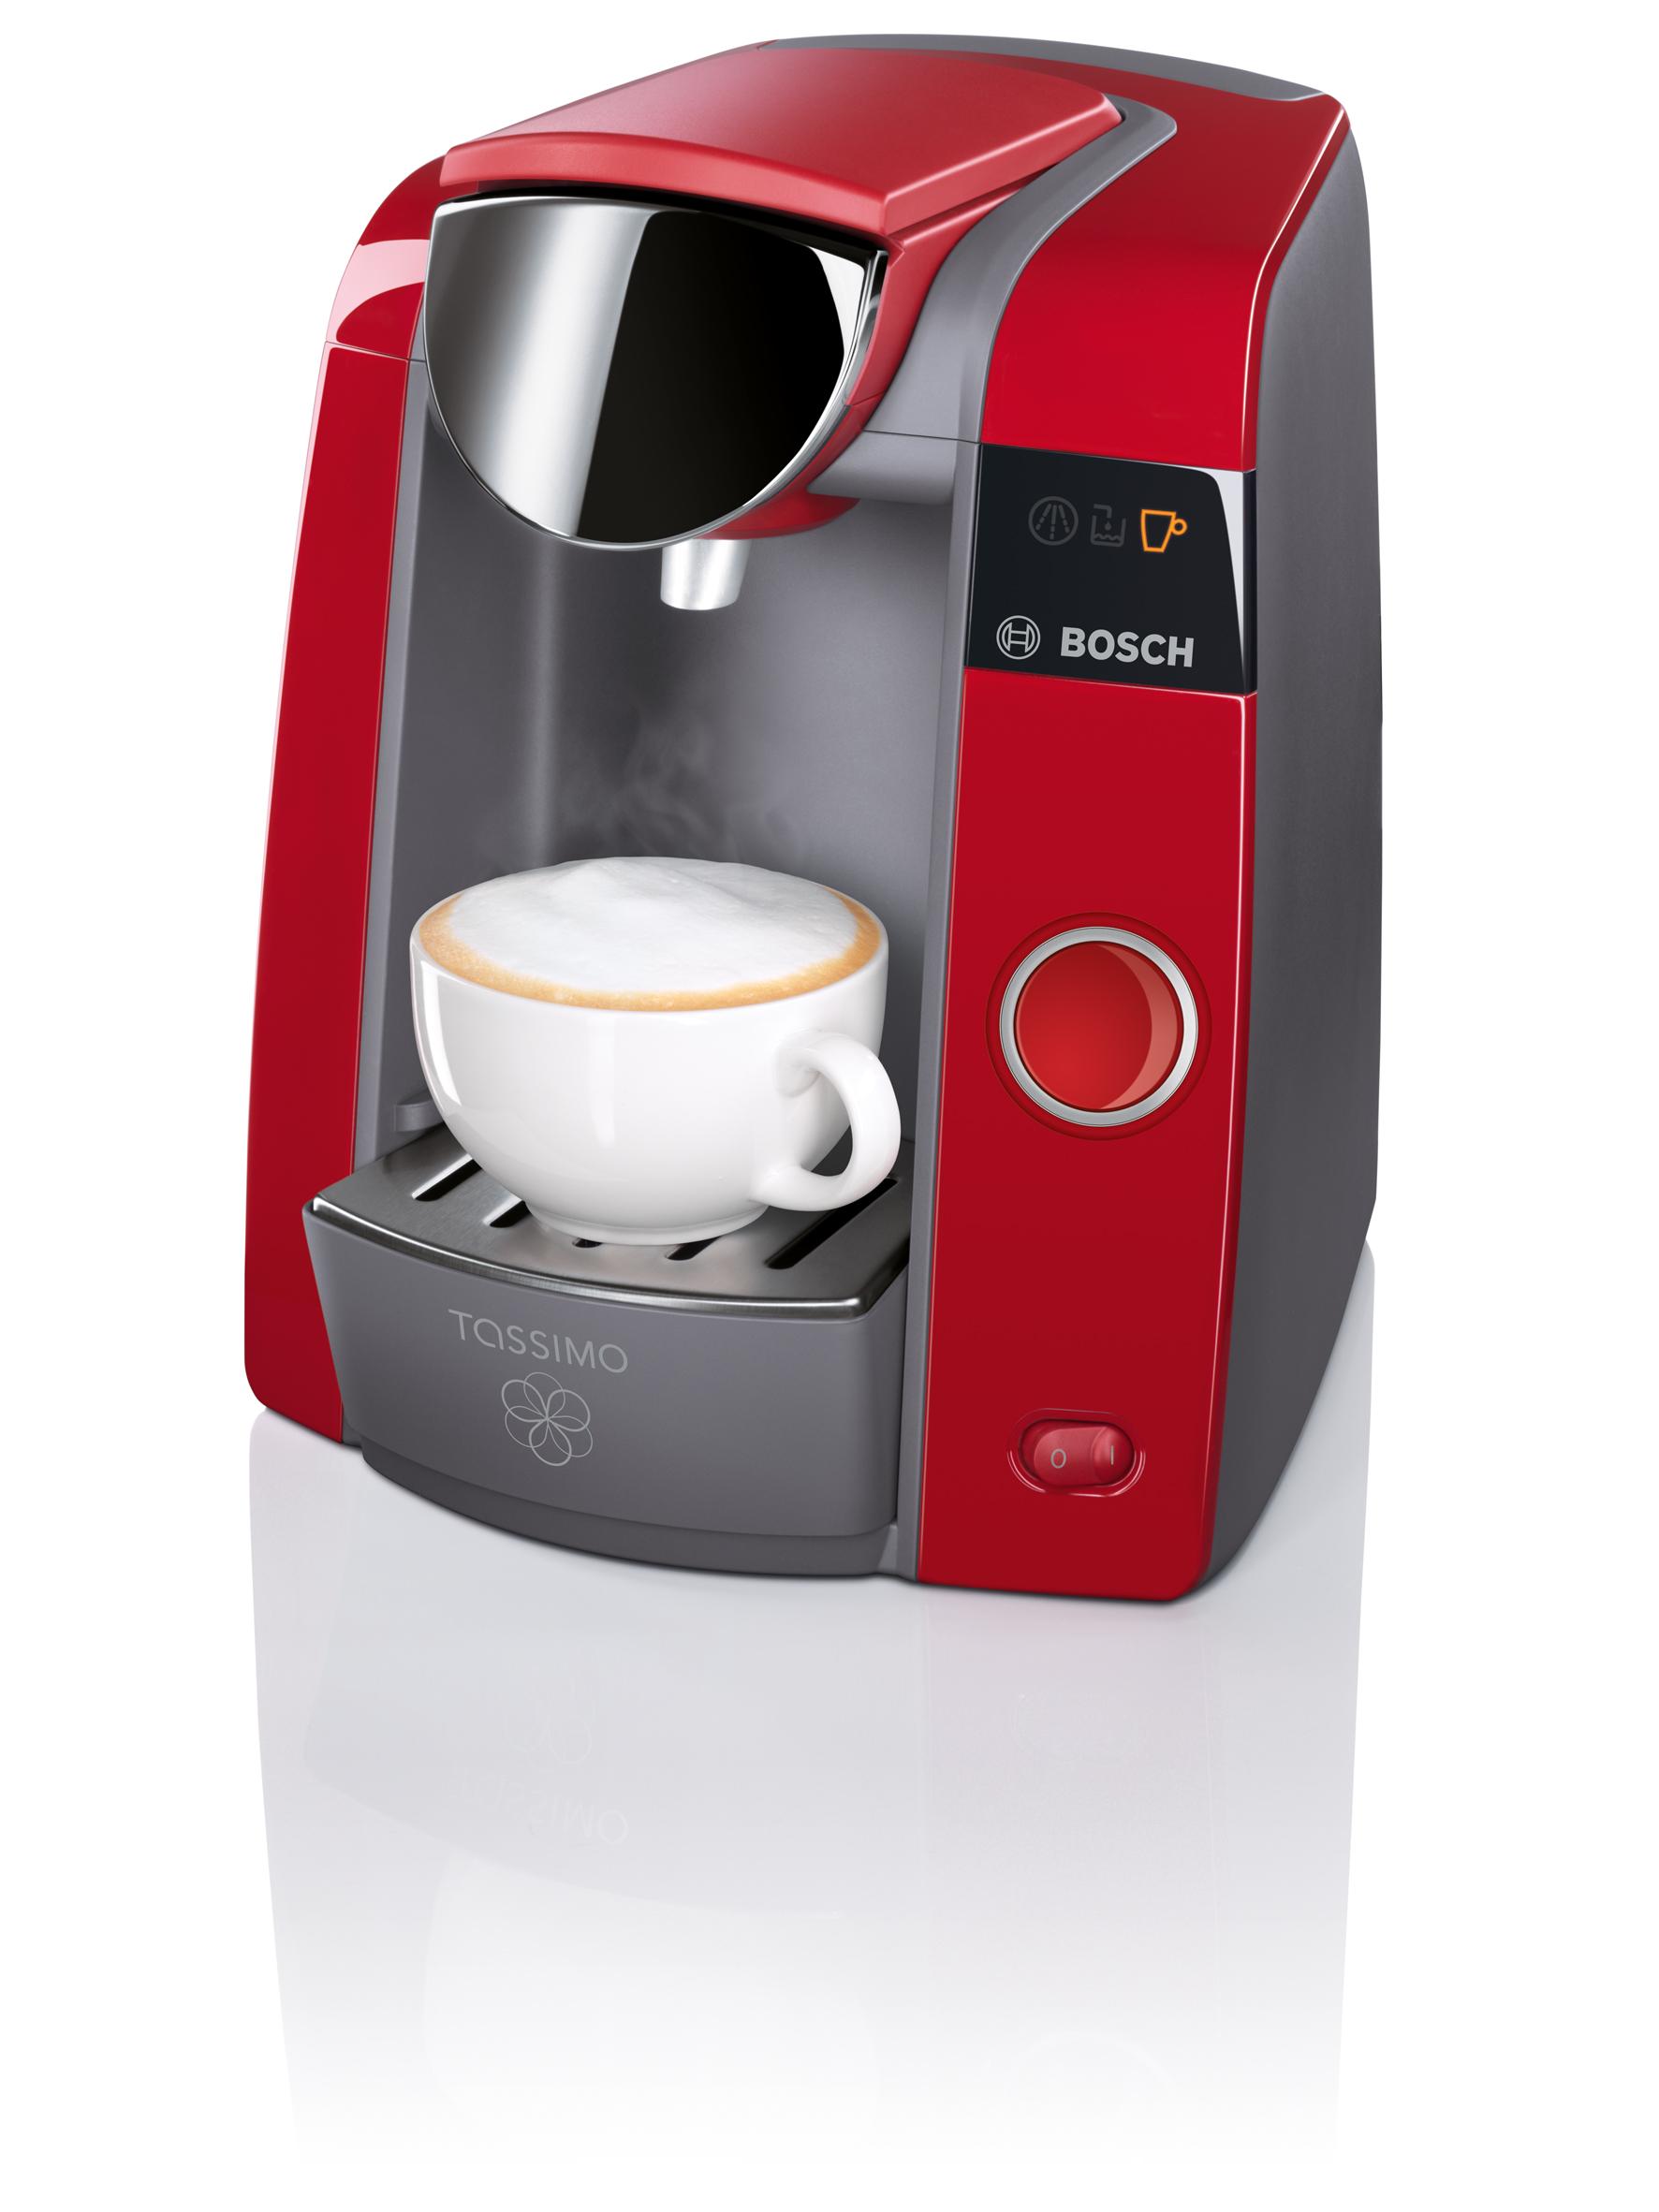 bosch tassimo joy kaffeemaschine kommt jetzt in rubin red. Black Bedroom Furniture Sets. Home Design Ideas